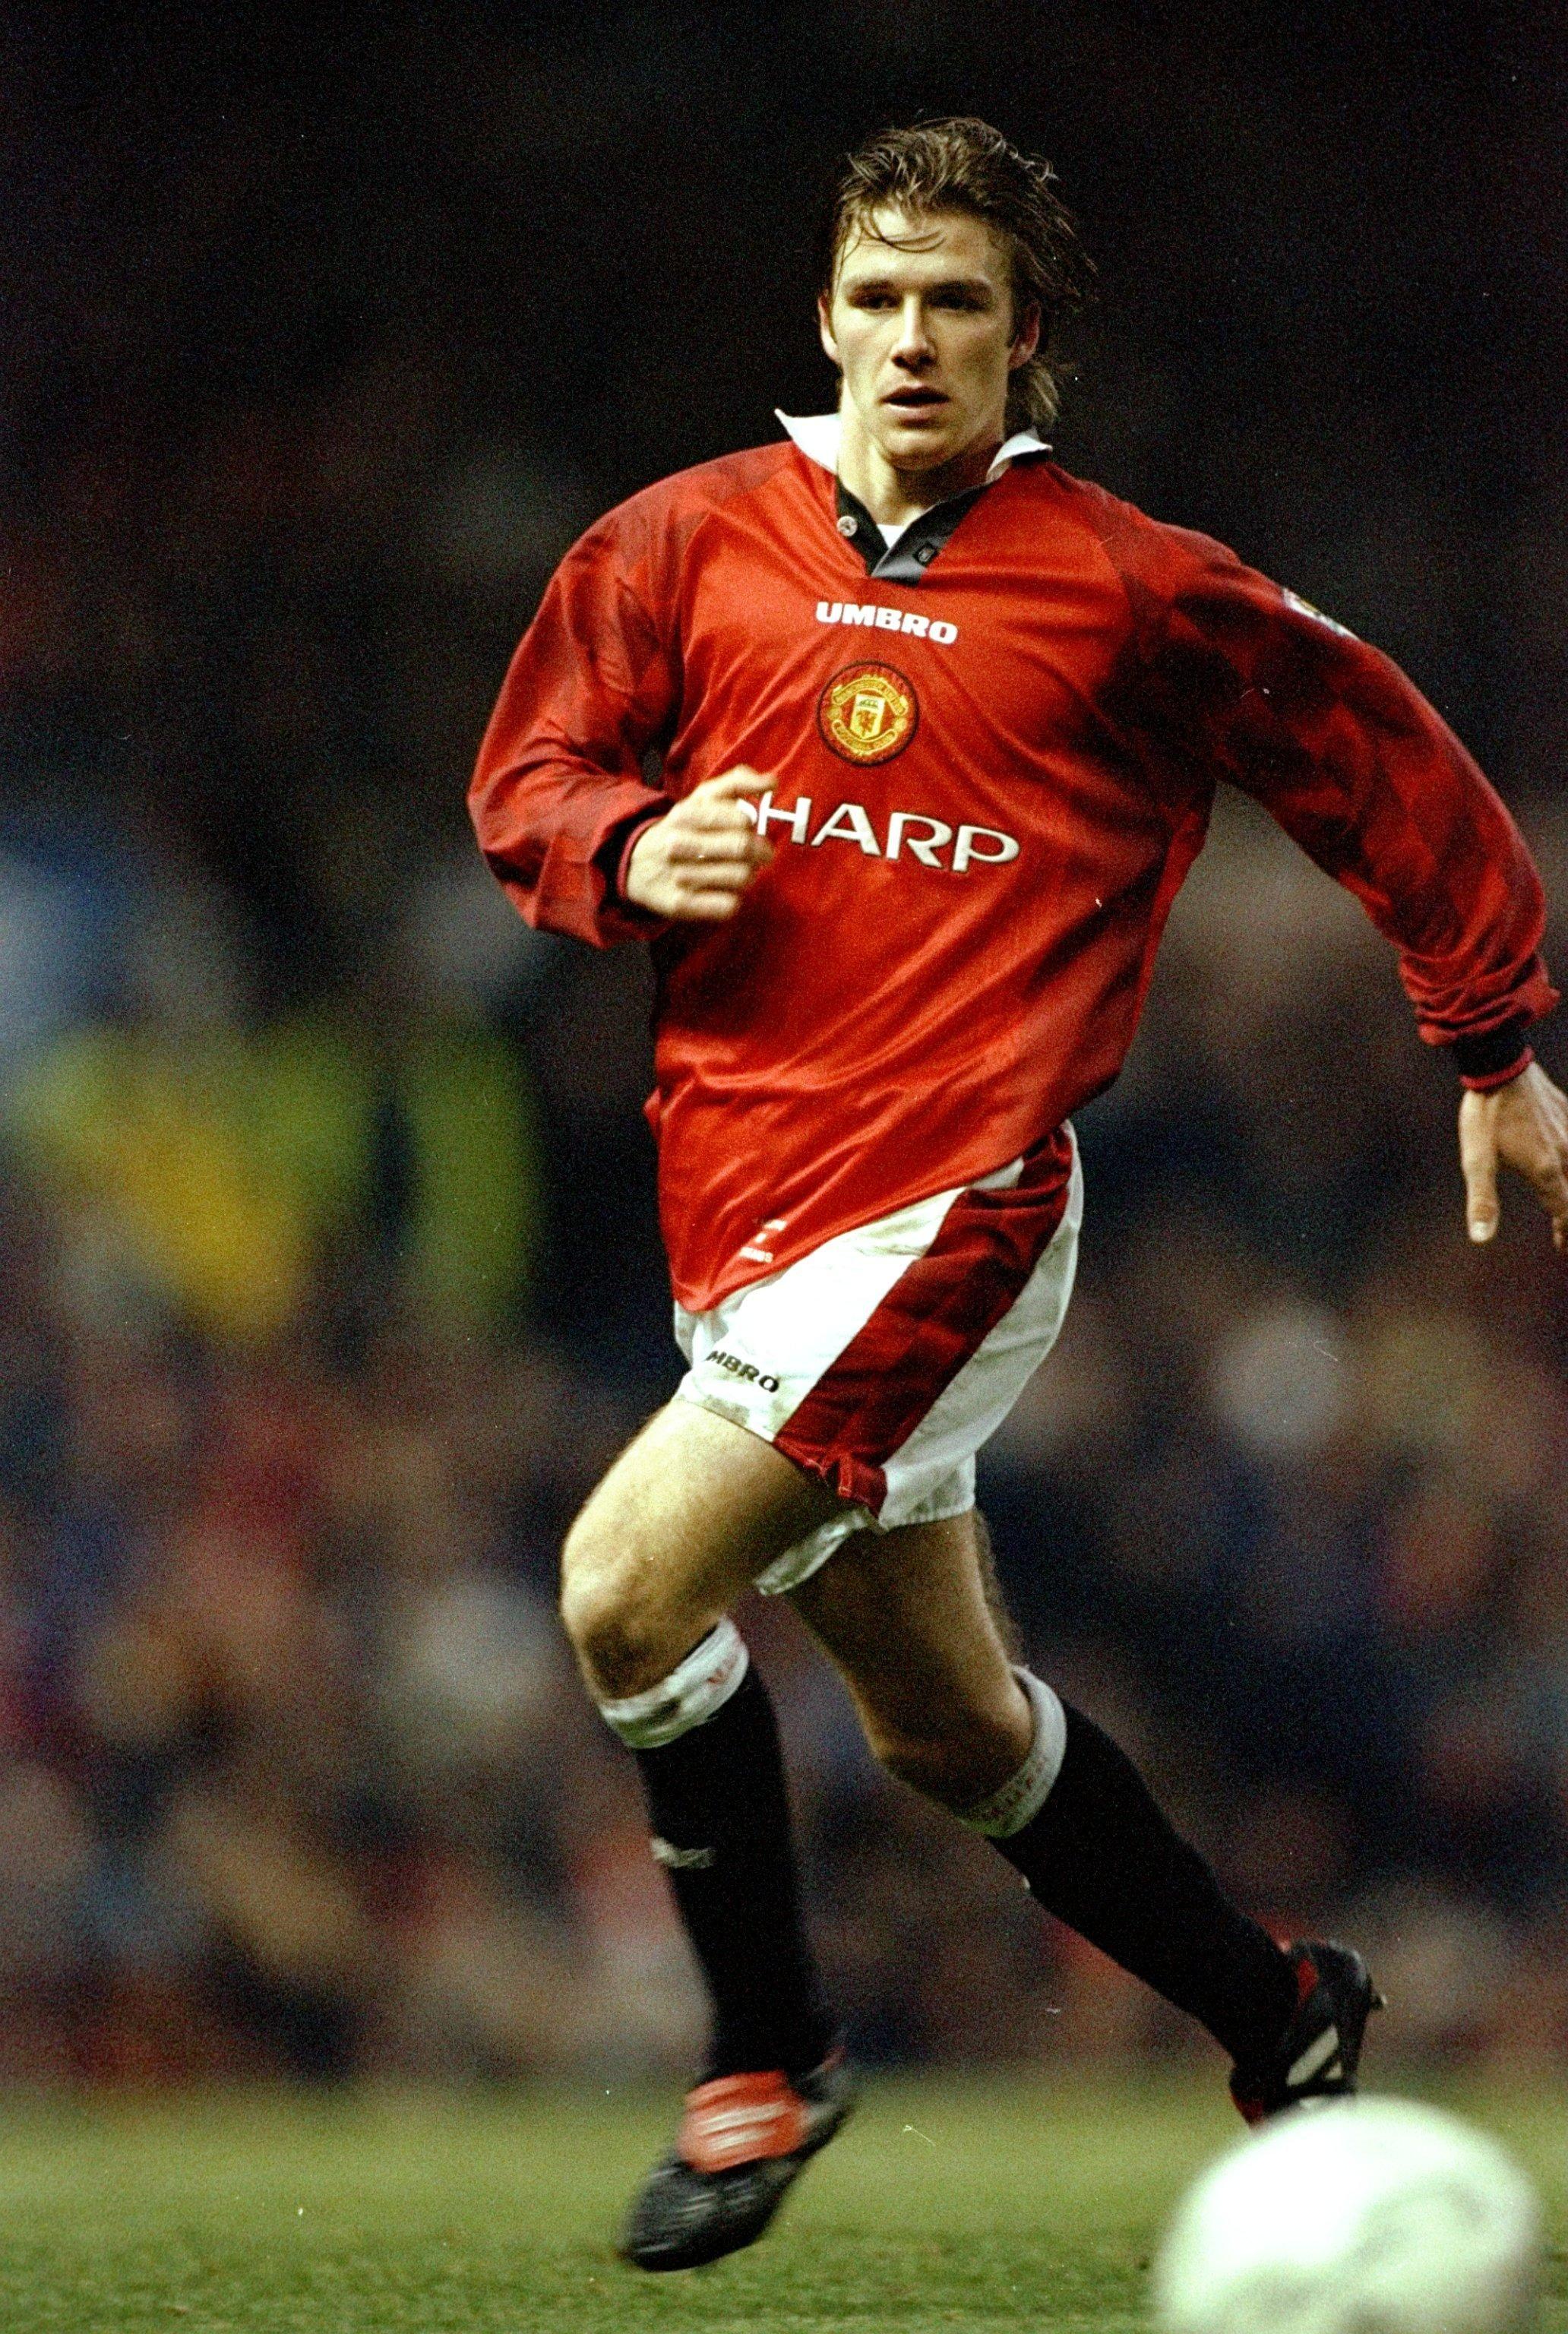 David Beckham in action against Leeds United at Old